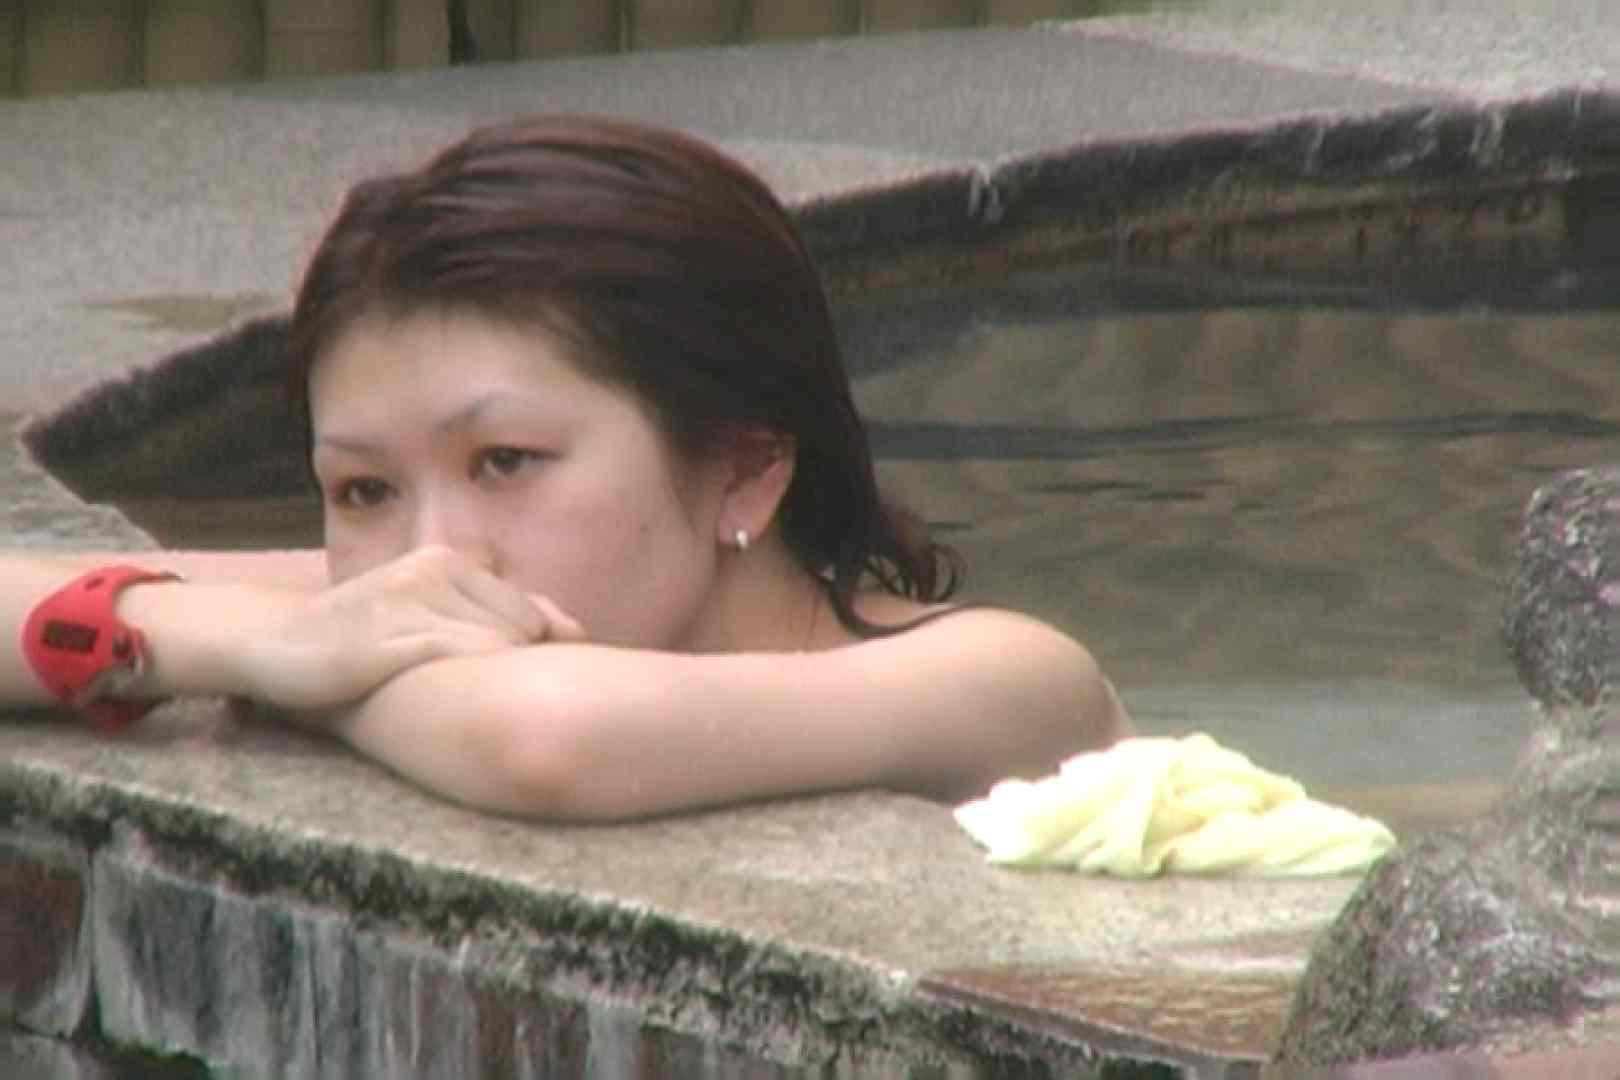 Aquaな露天風呂Vol.639 盗撮師作品 おめこ無修正動画無料 90pic 38